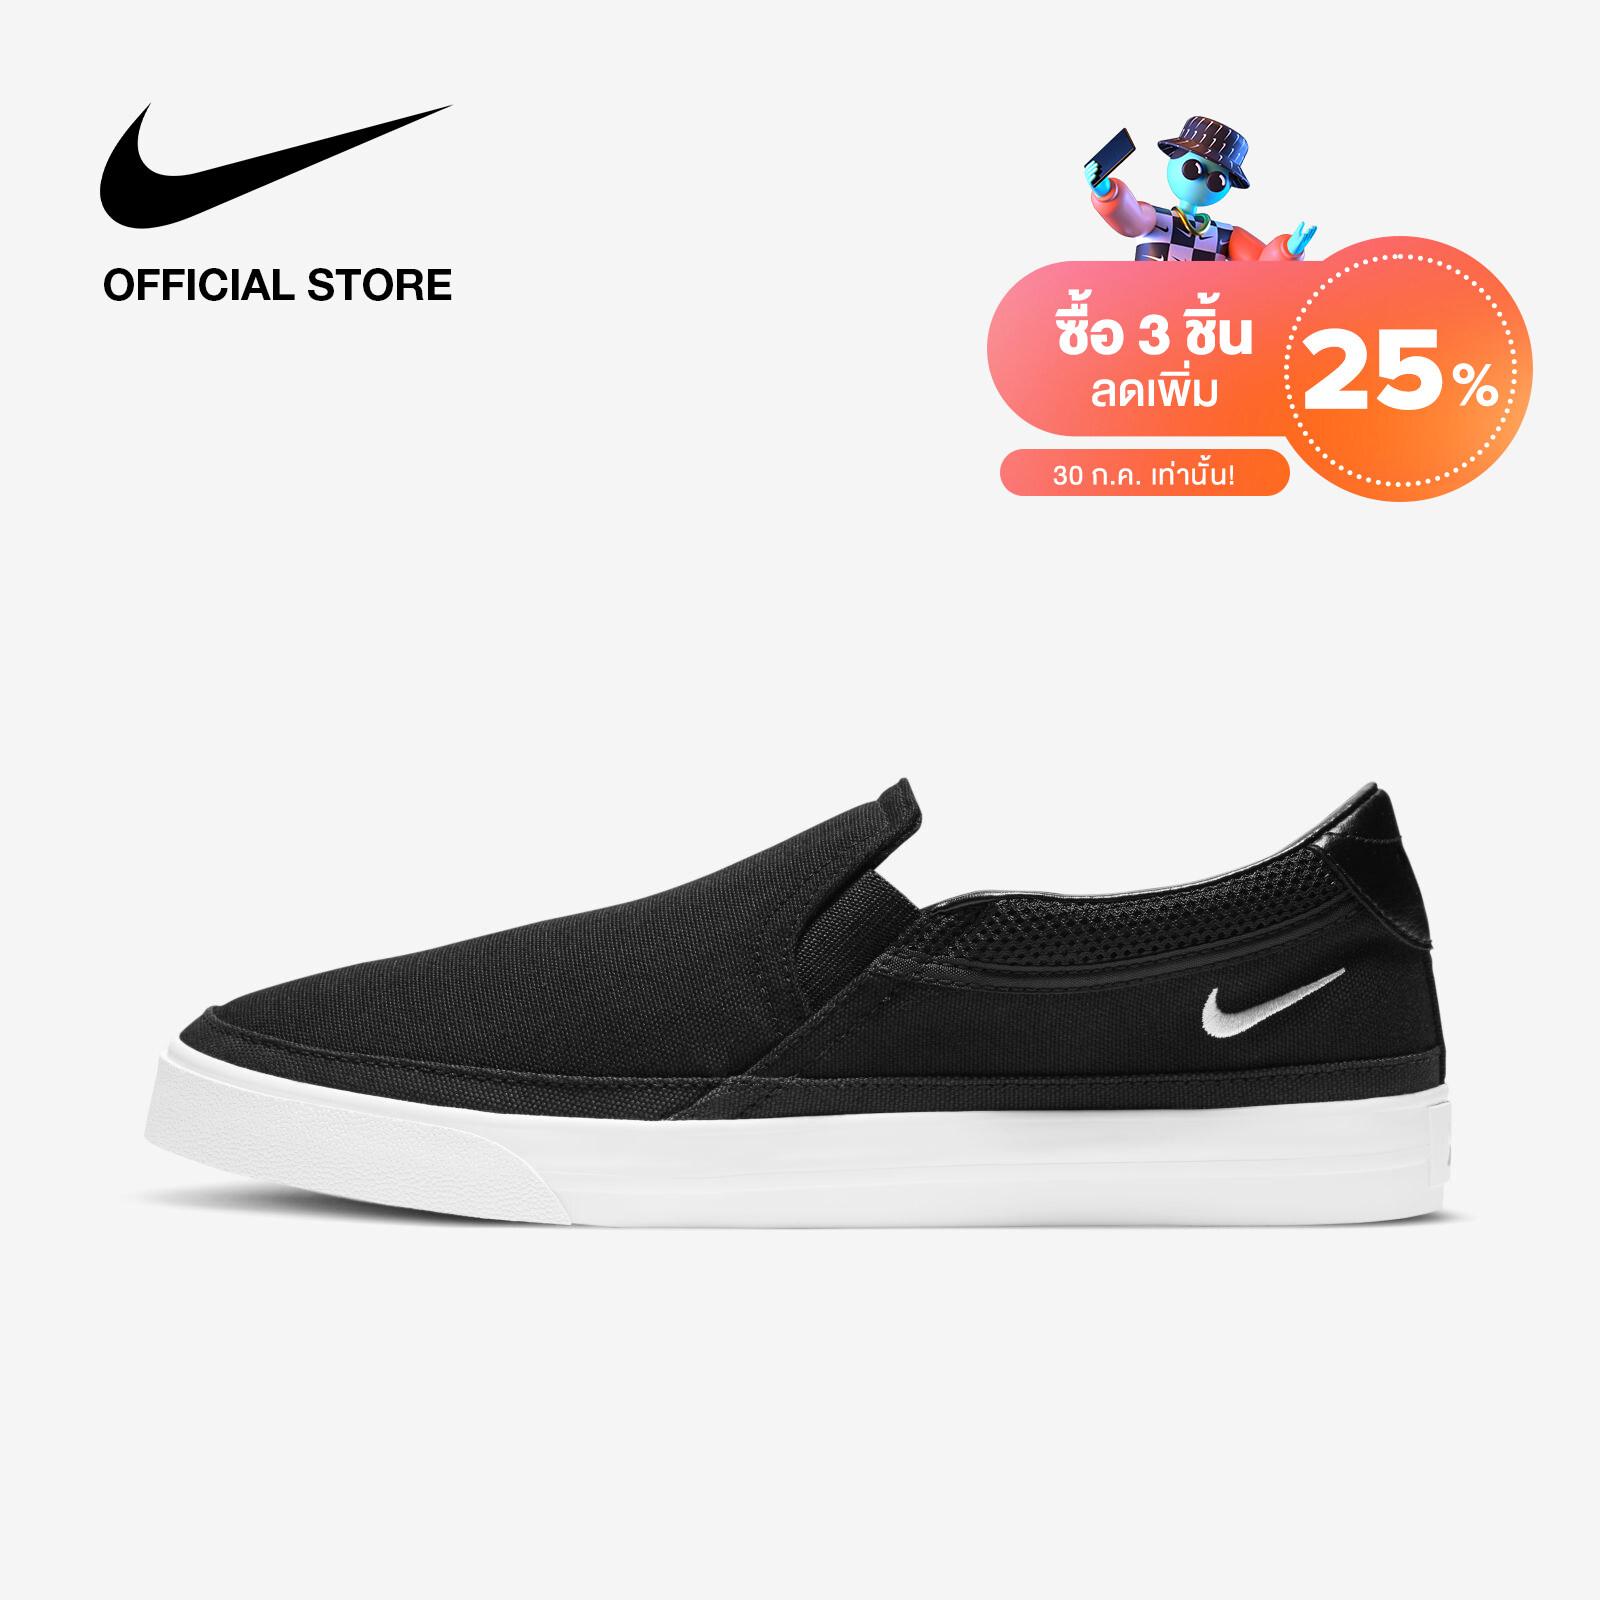 Nike Womens court Legacy Slip-On - Black ไนกี้ รองเท้าลำลองผู้หญิง คอร์ท เลกาซี่ - สีดำ.